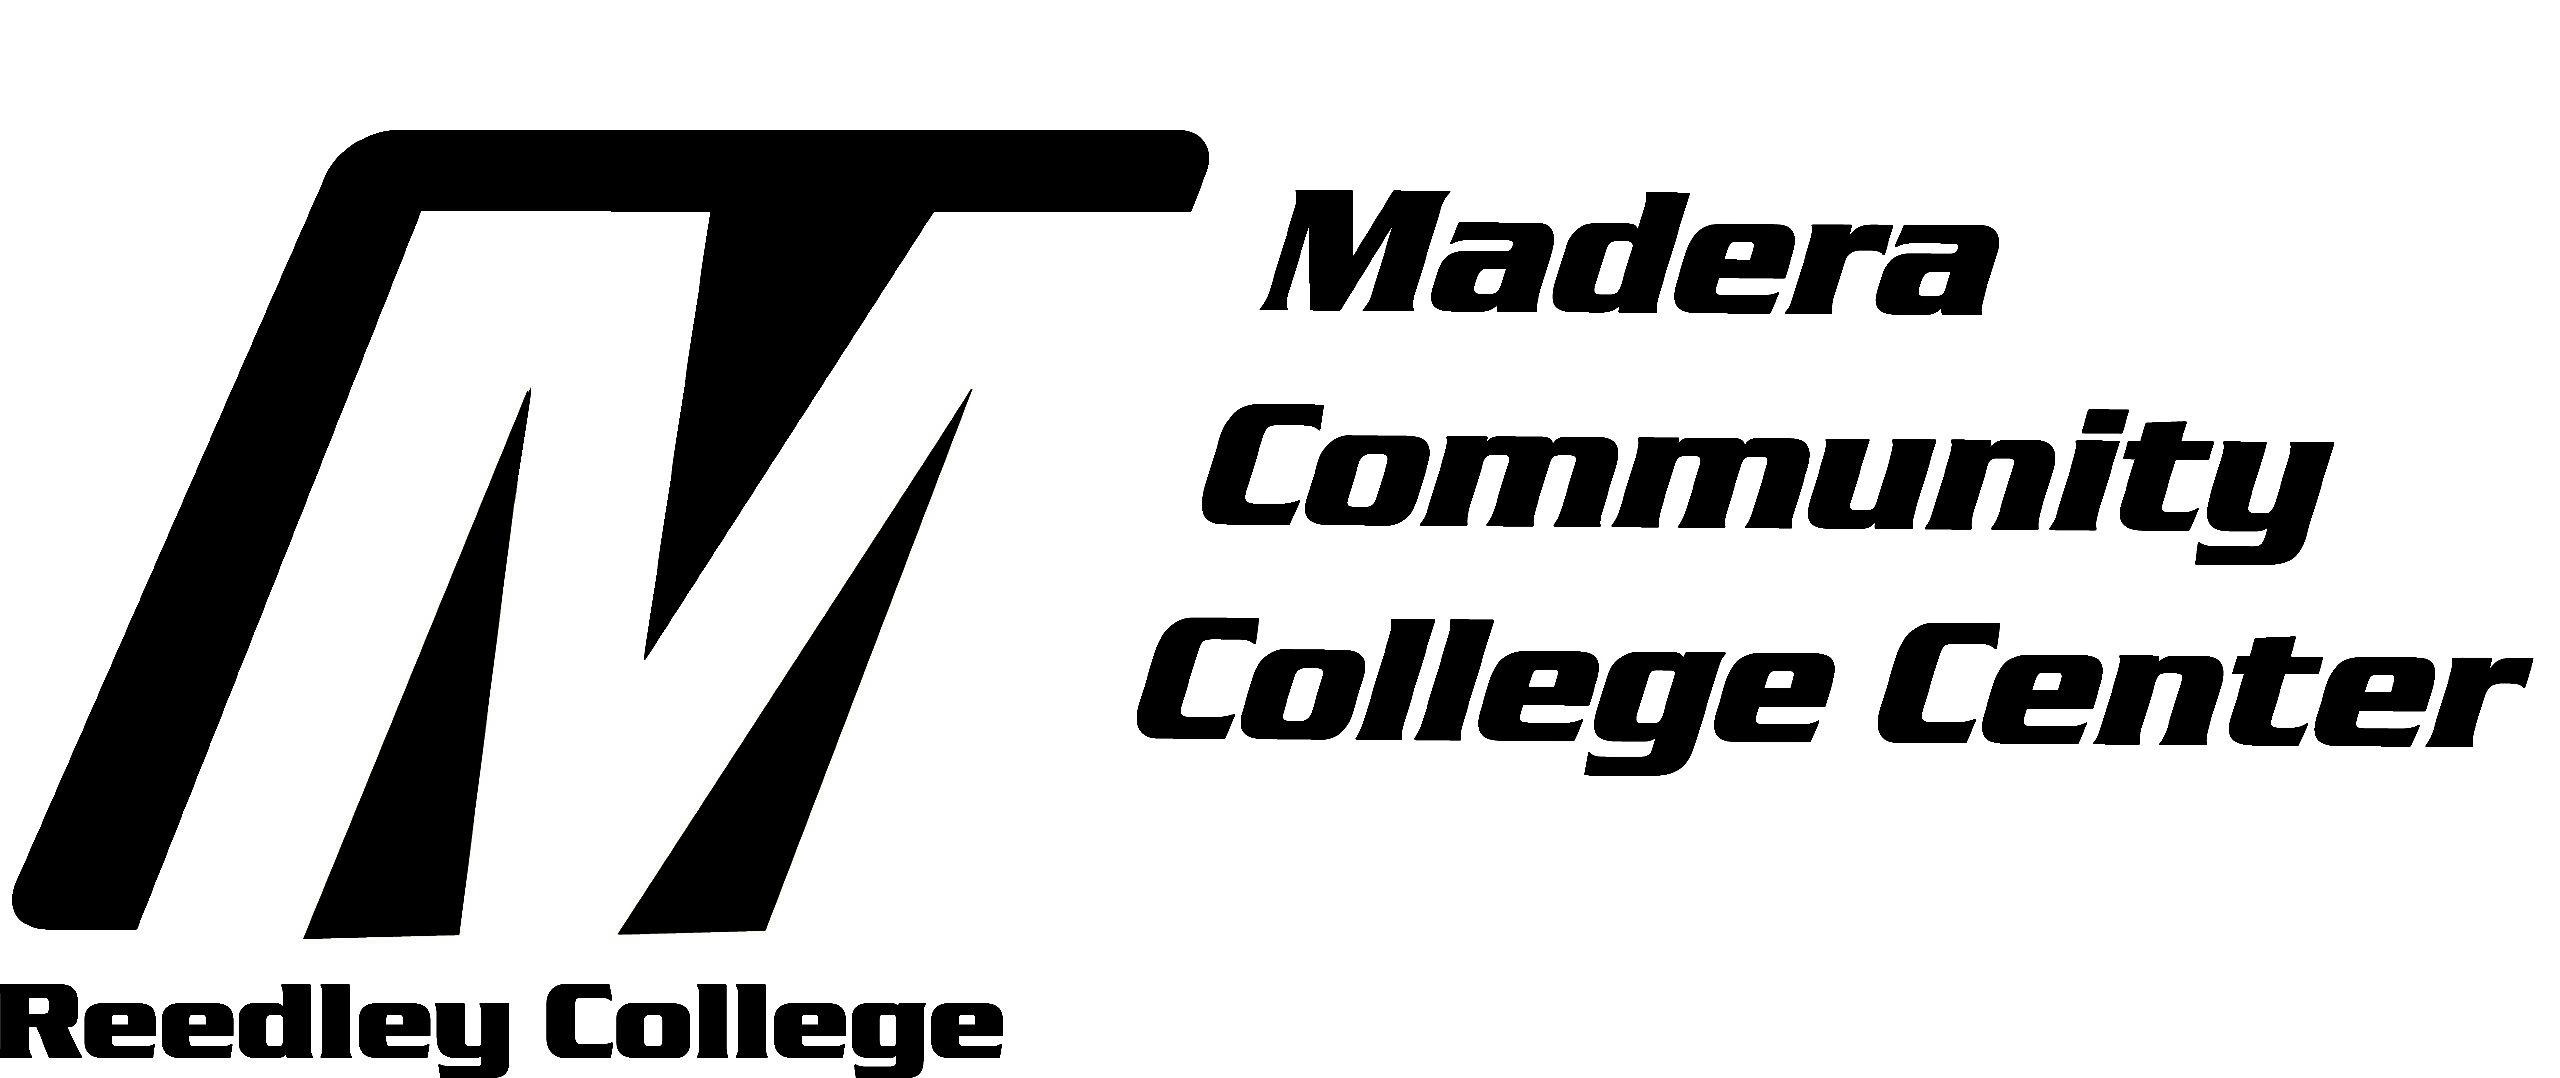 Madera Community College Center Logo